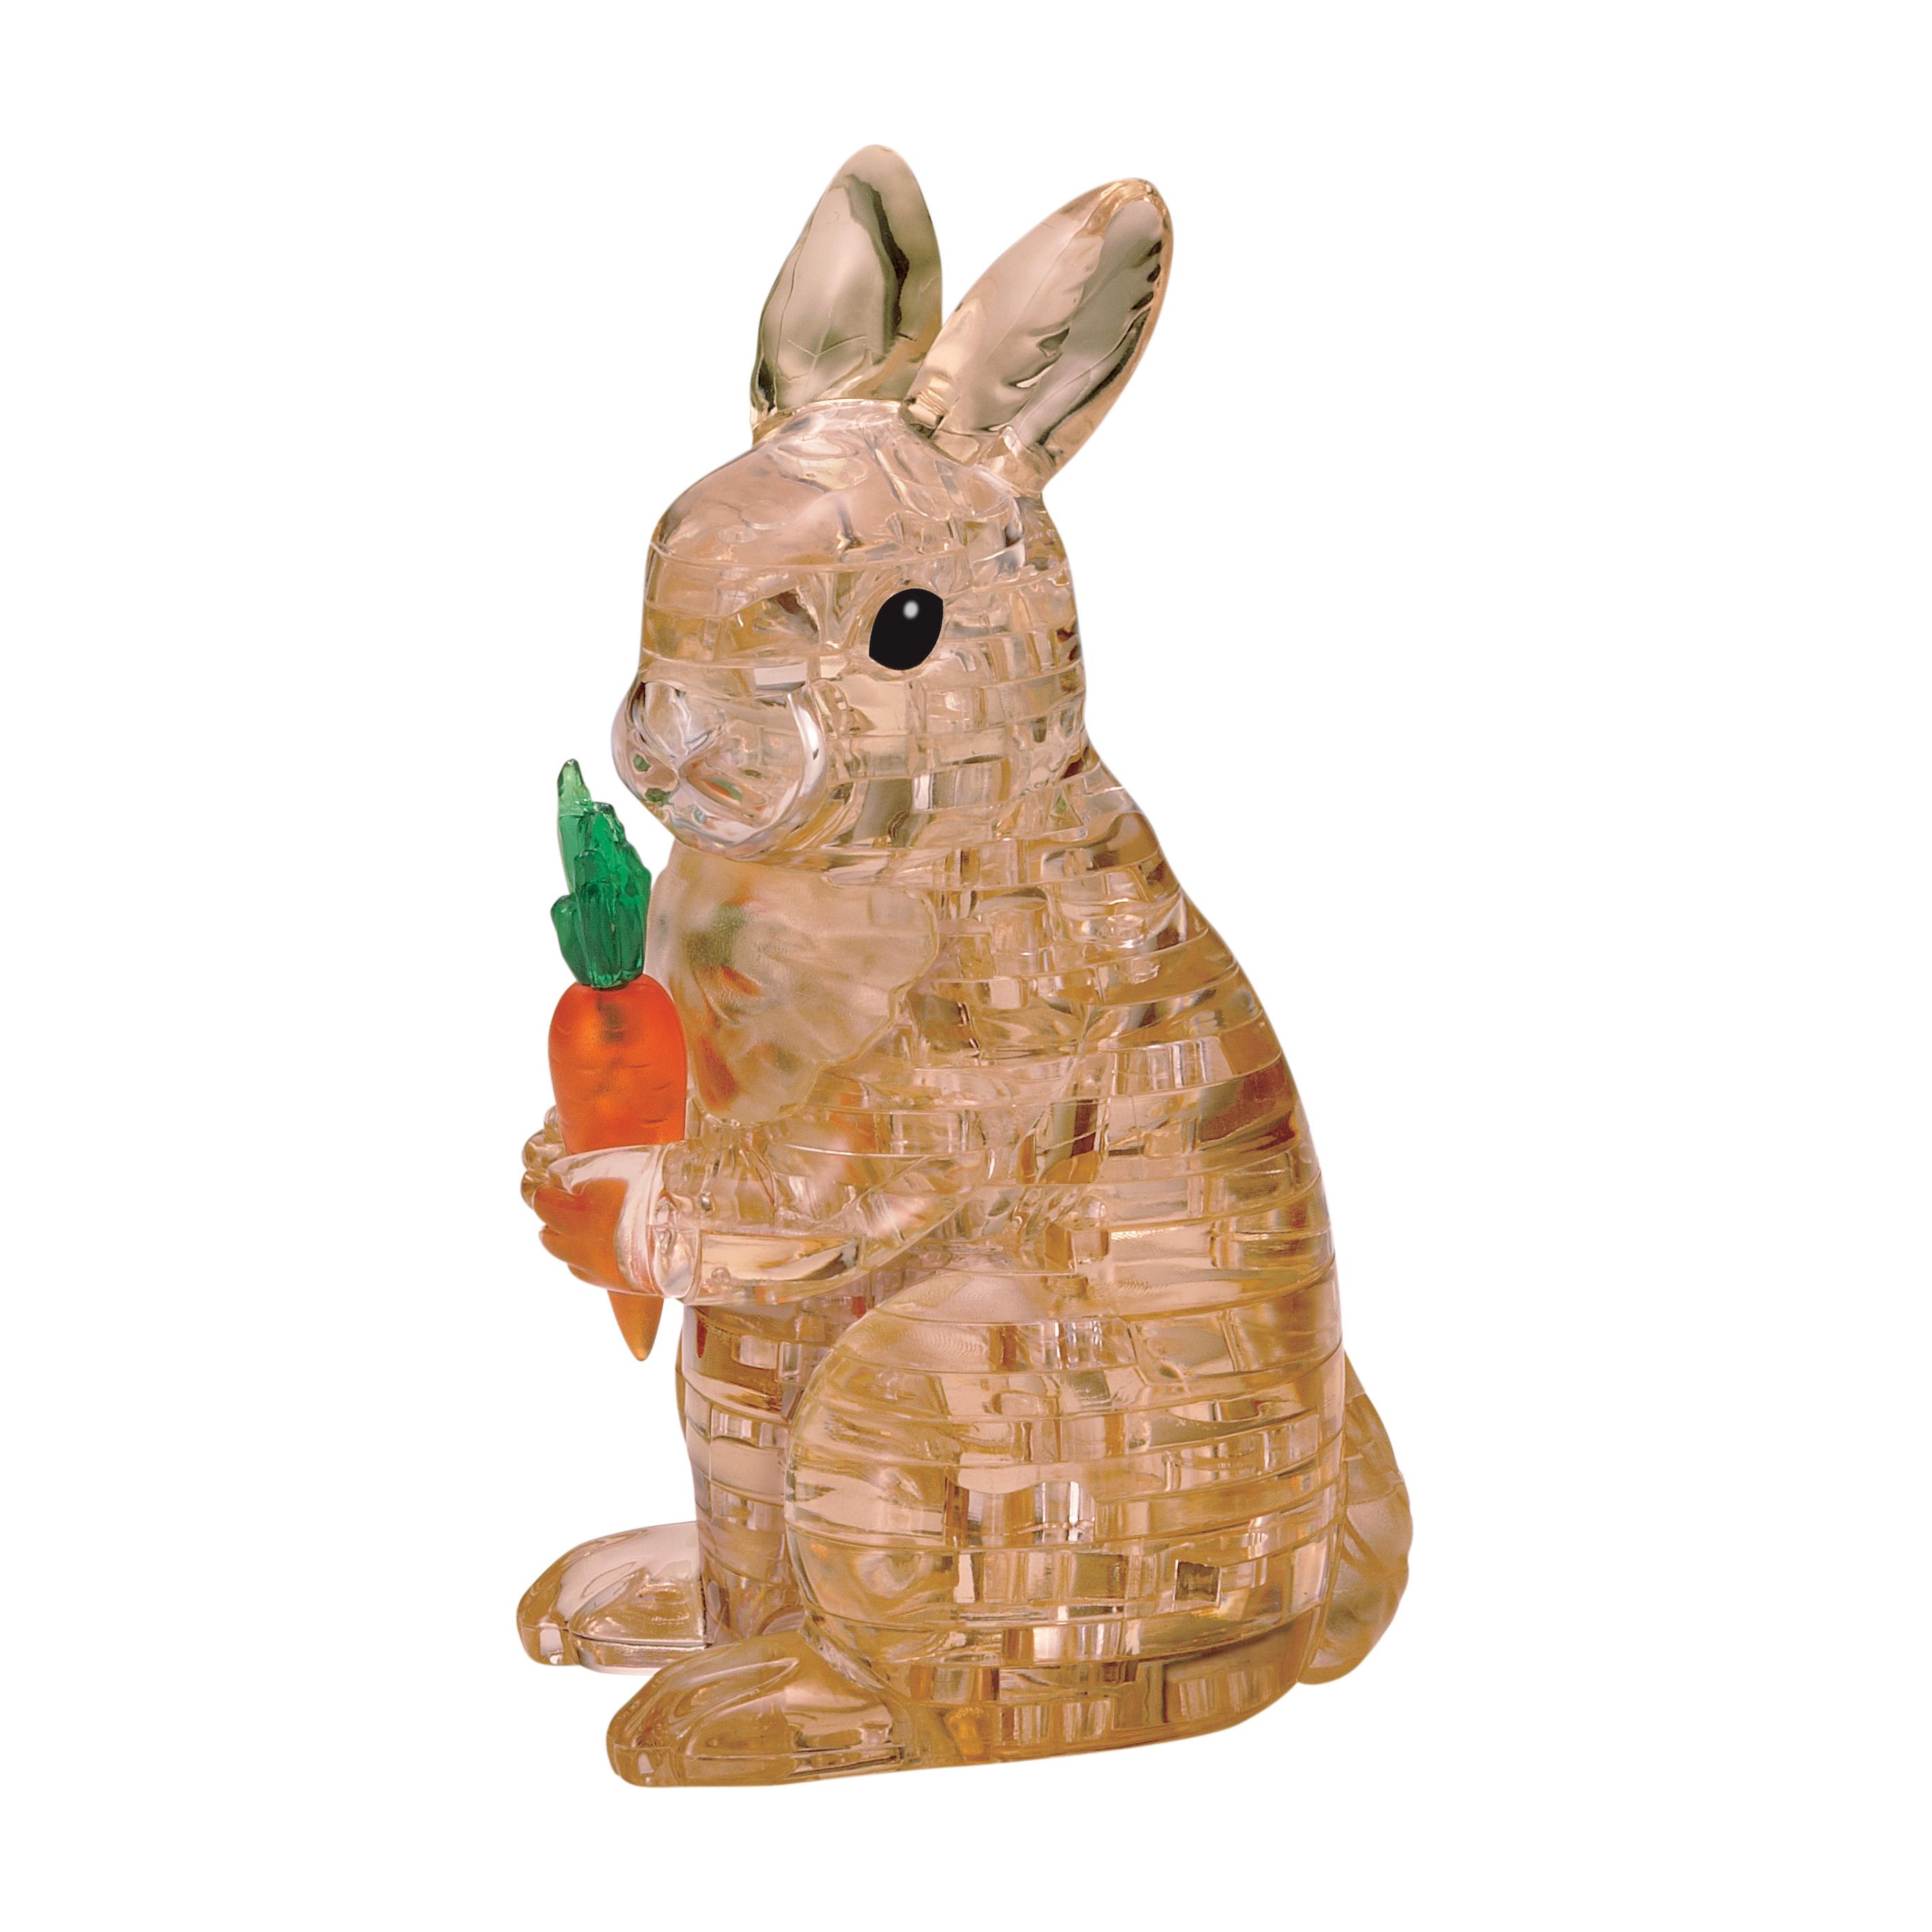 3D Crystal Puzzle - Rabbit, 43 Pcs